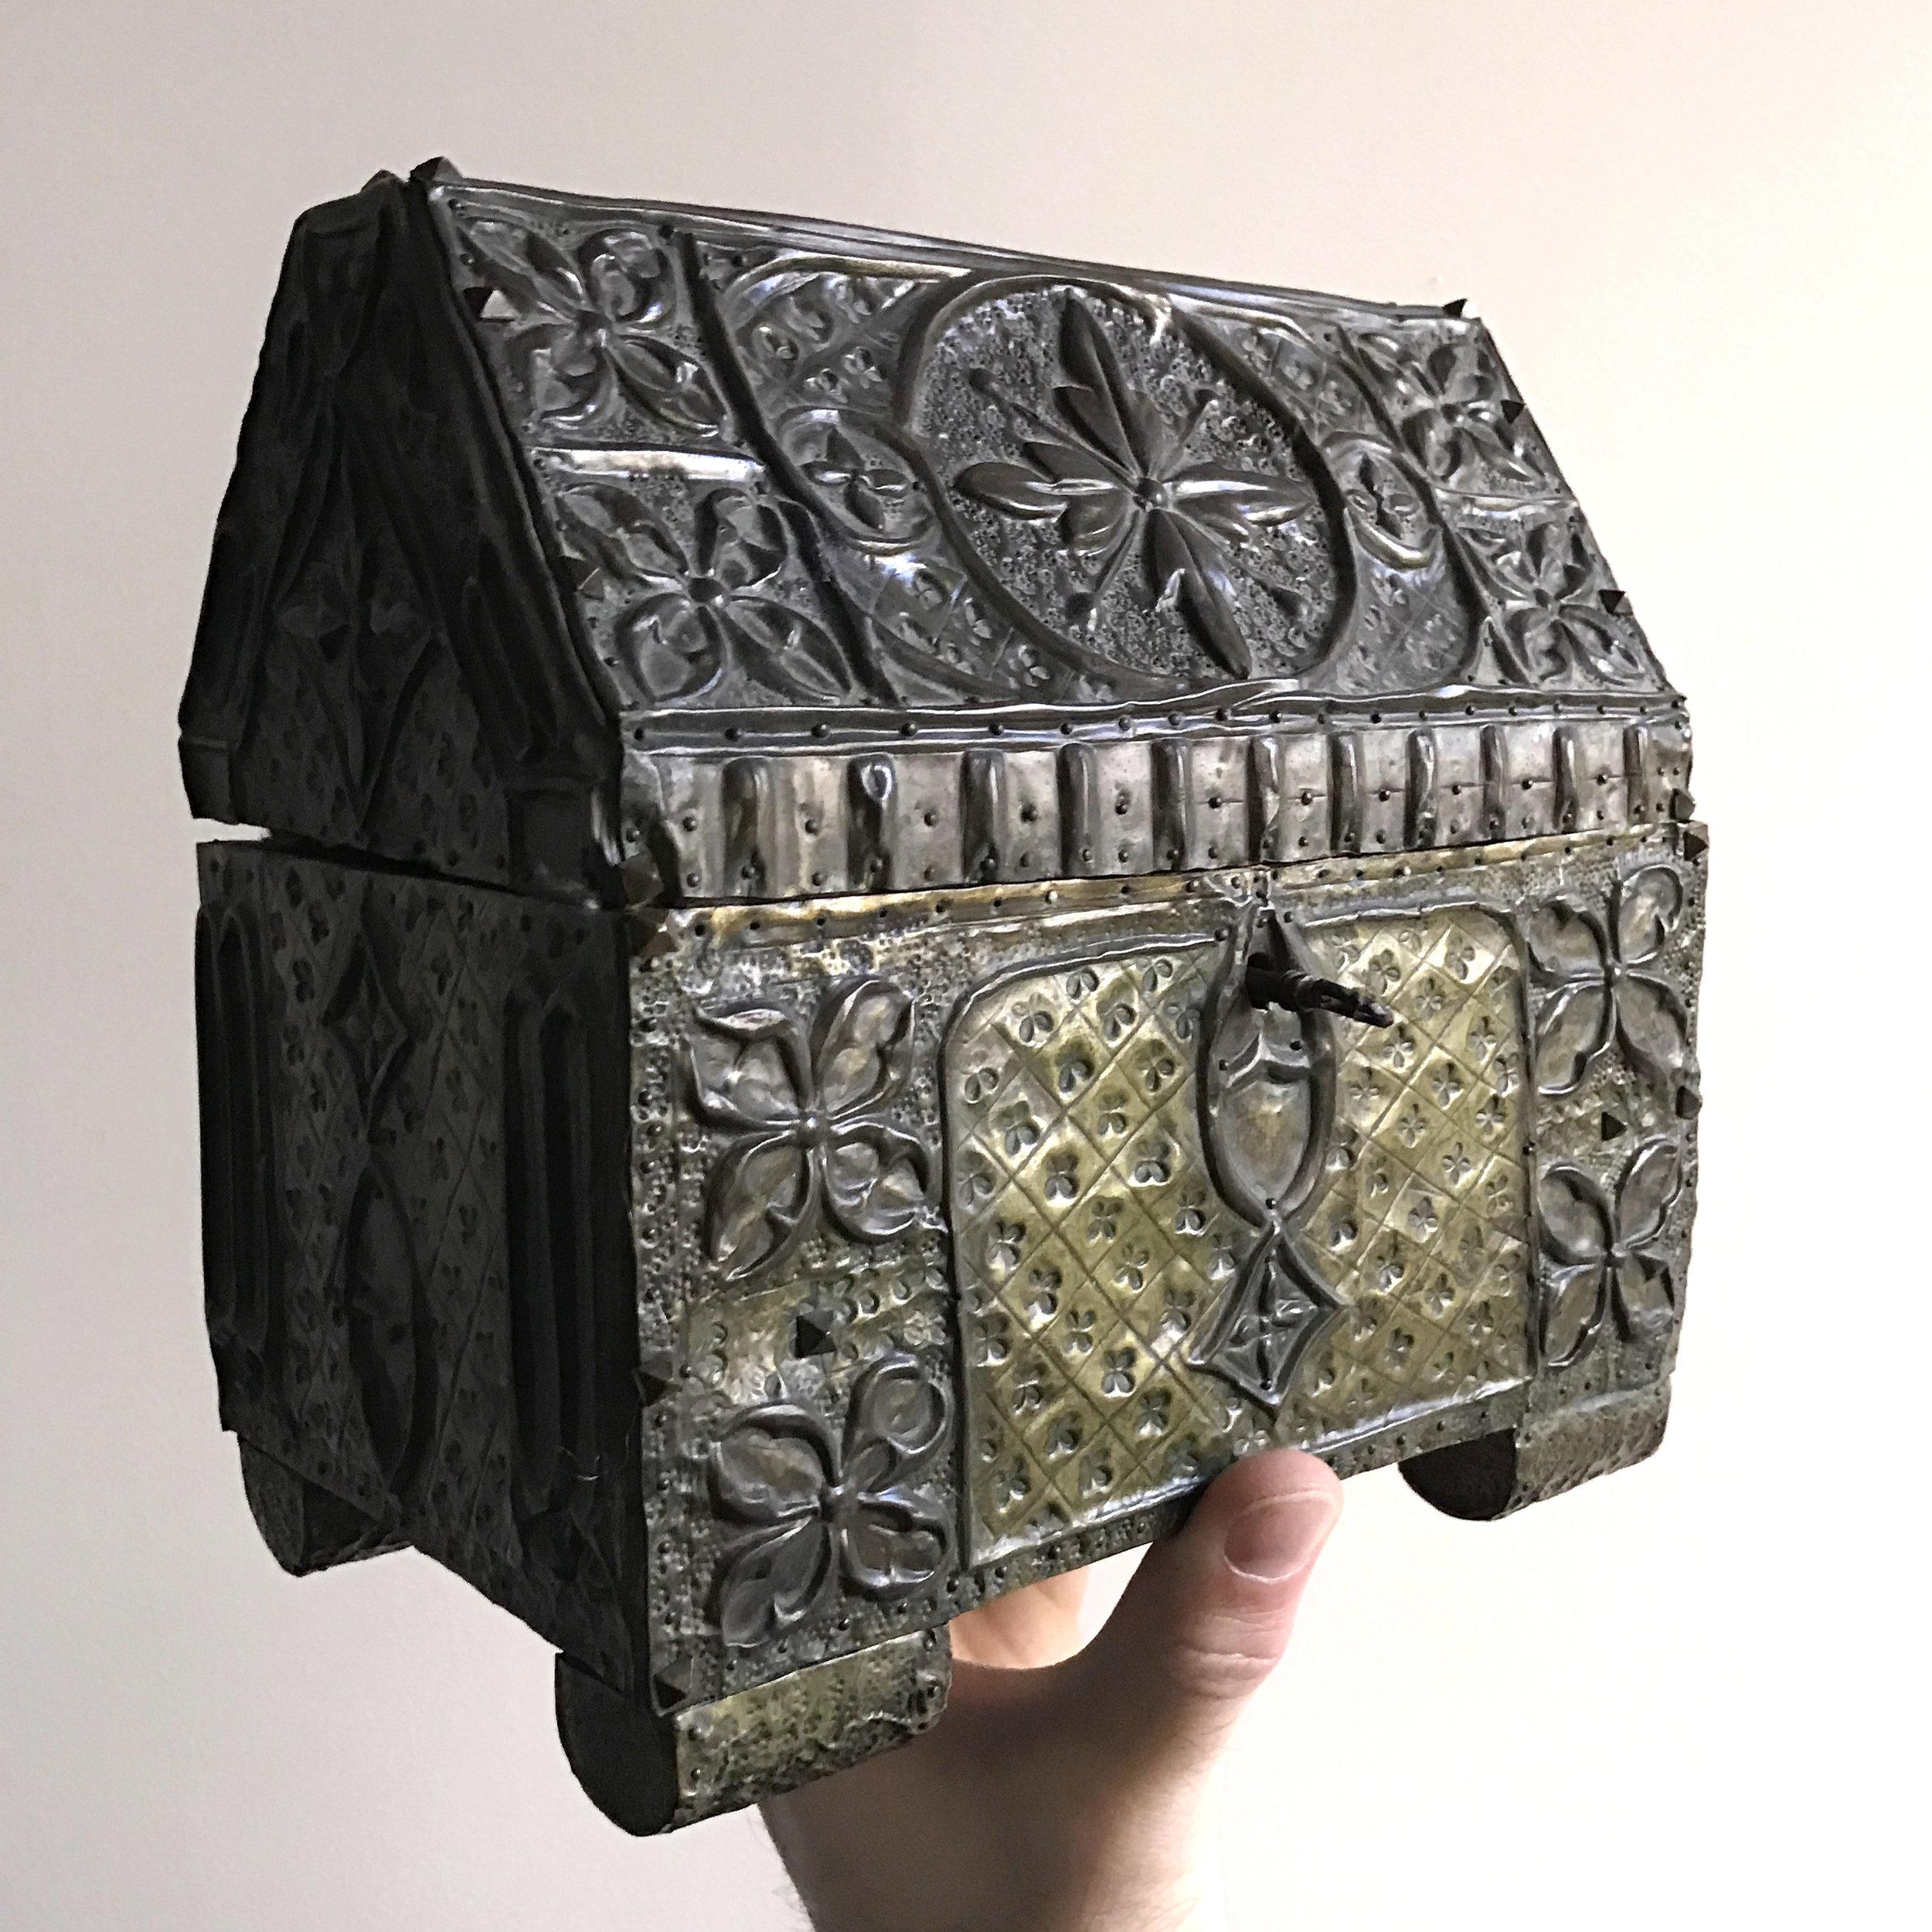 teremok_antiques_french_casket.JPG